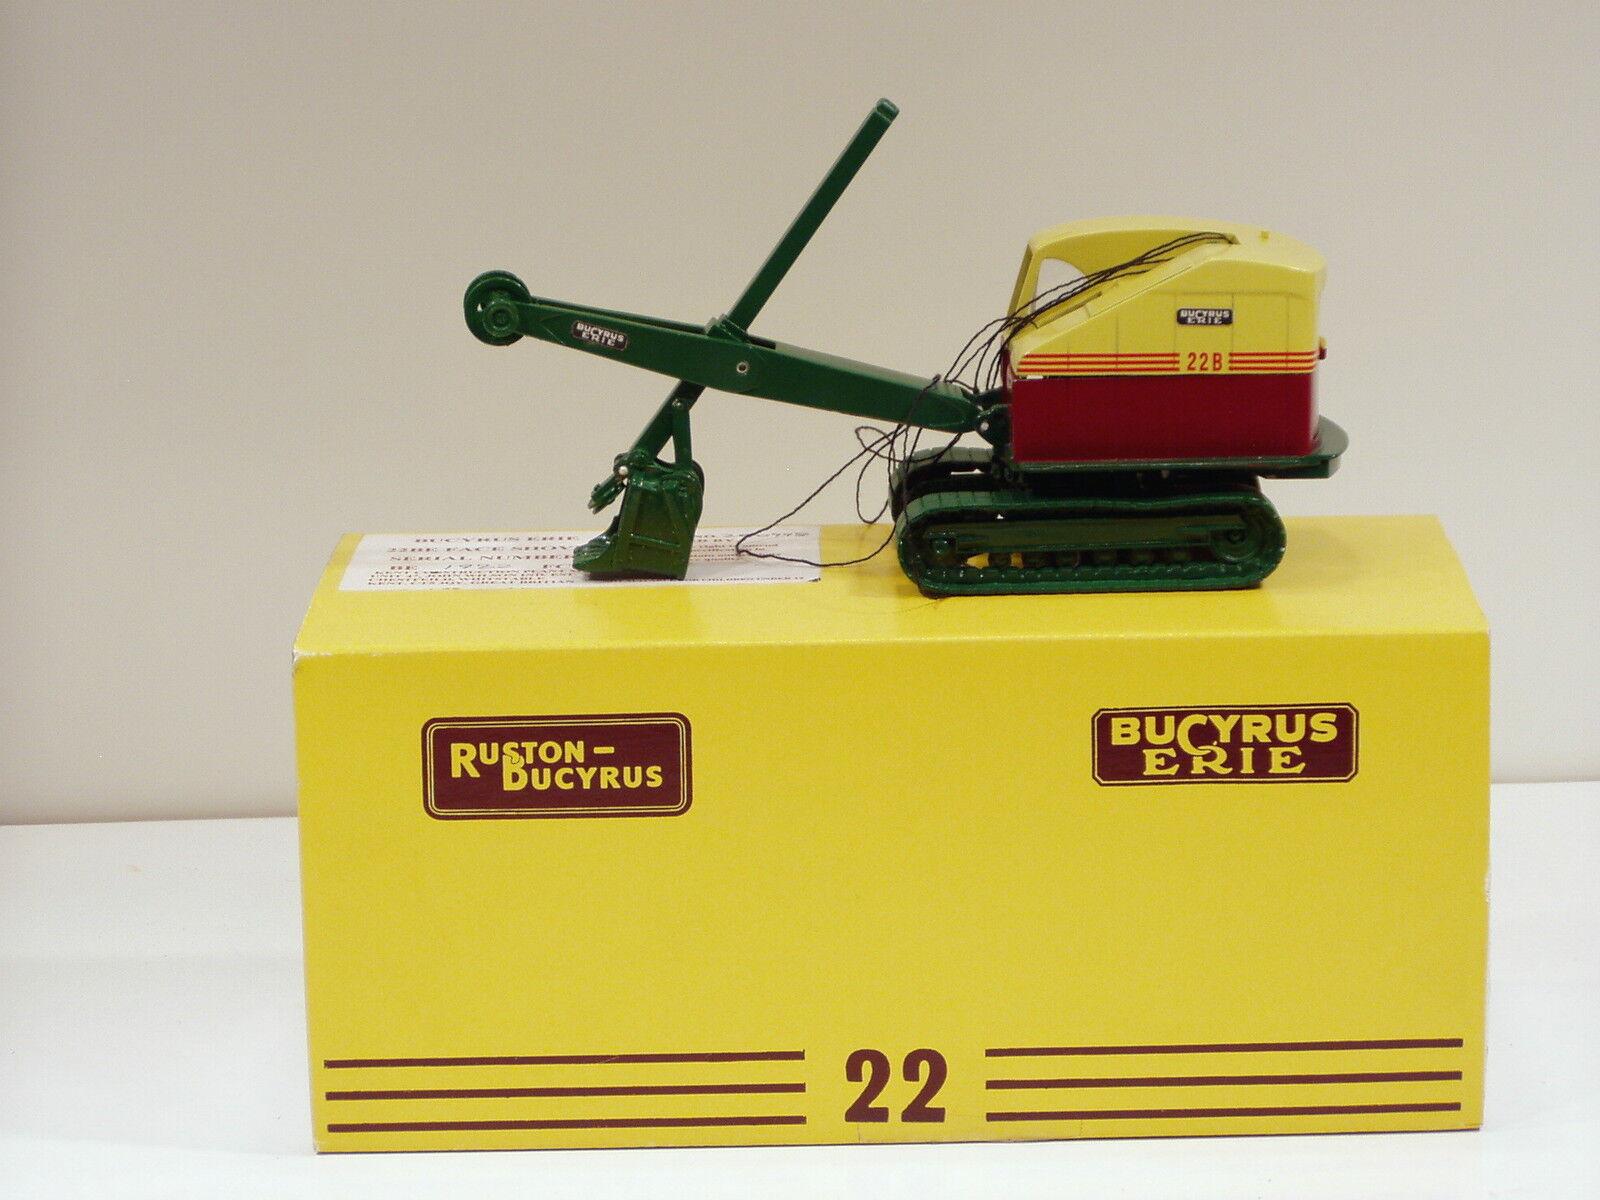 1950 - 1962 Bupyrus Erie 22B Cable Shovel - 1 48 - Kent Models of UK